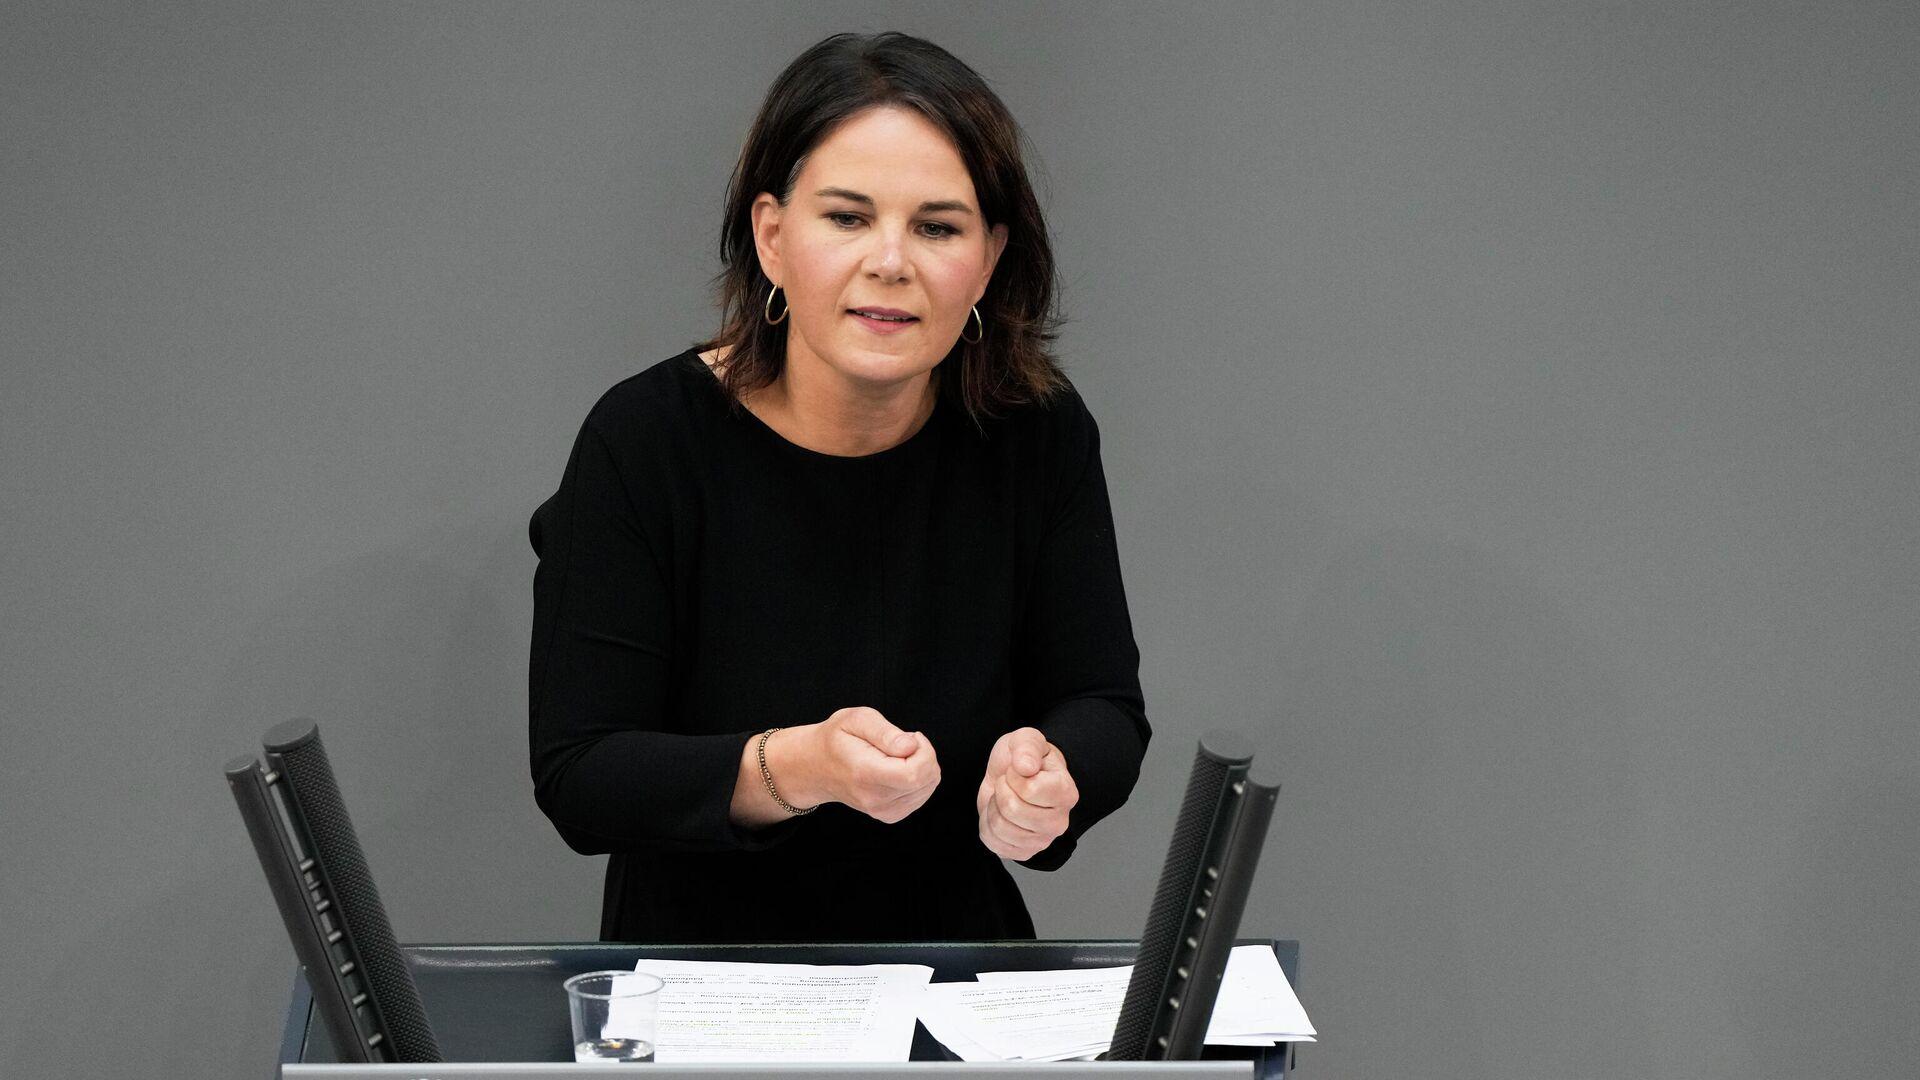 Grünen-Kanzlerkandidatin Annalena Baerbock - SNA, 1920, 13.09.2021